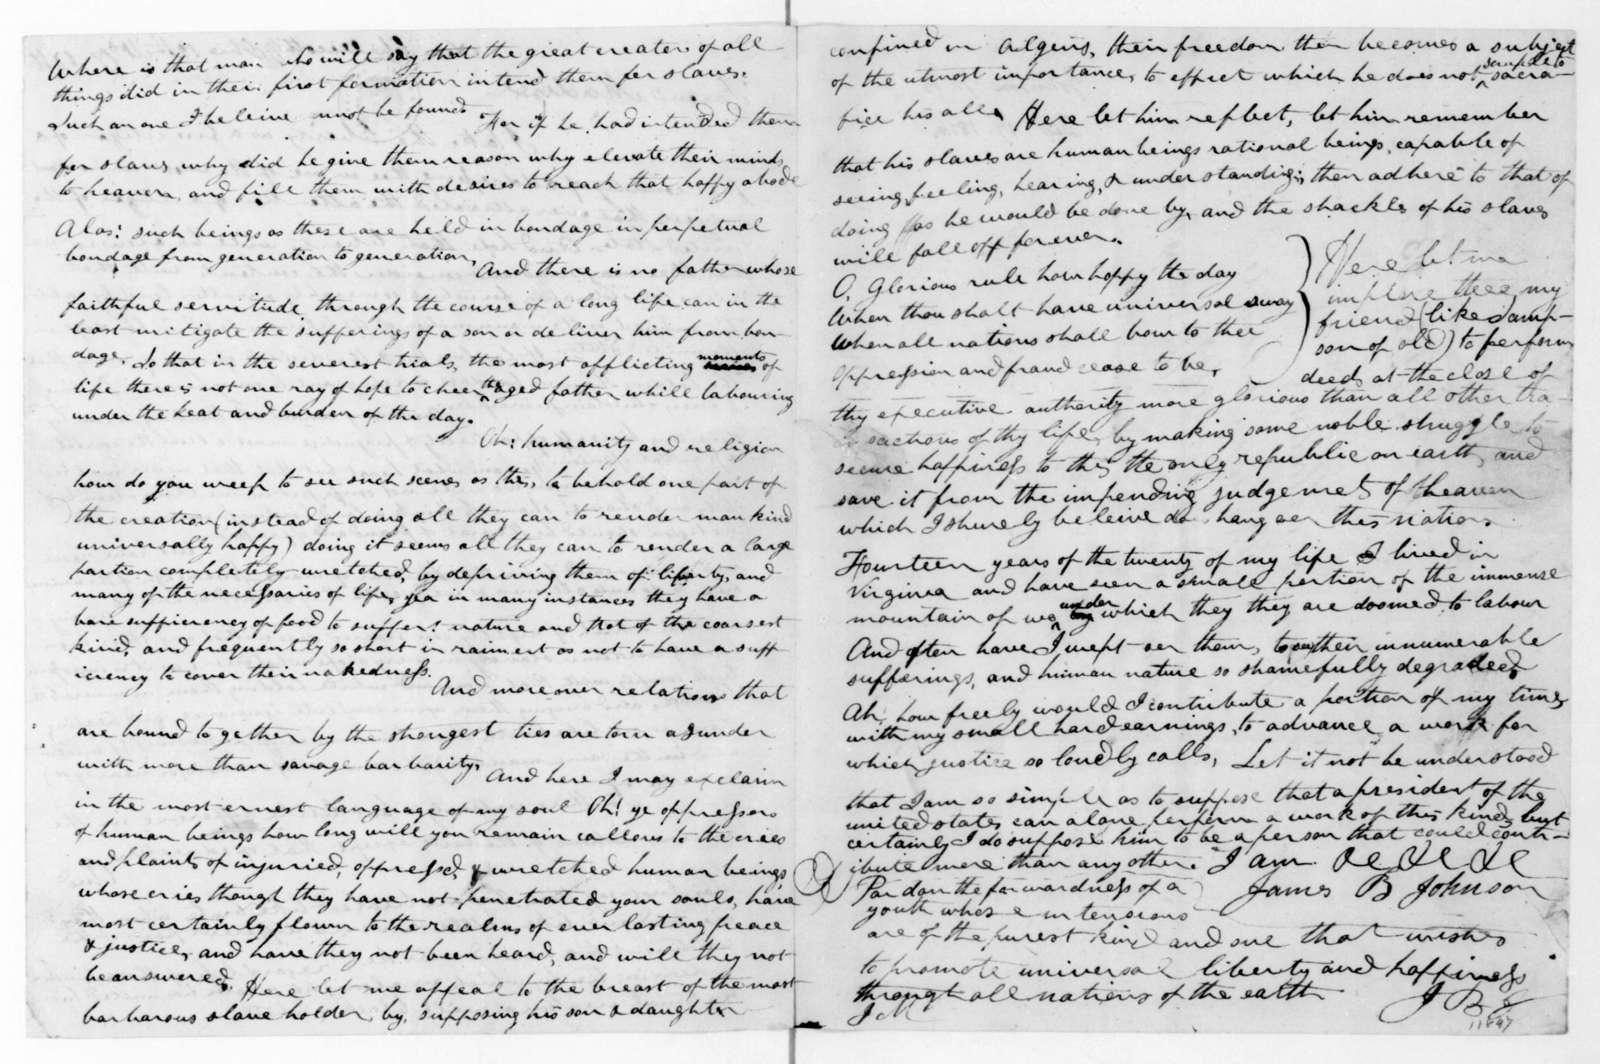 James B. Johnson to James Madison, December 17, 1816.